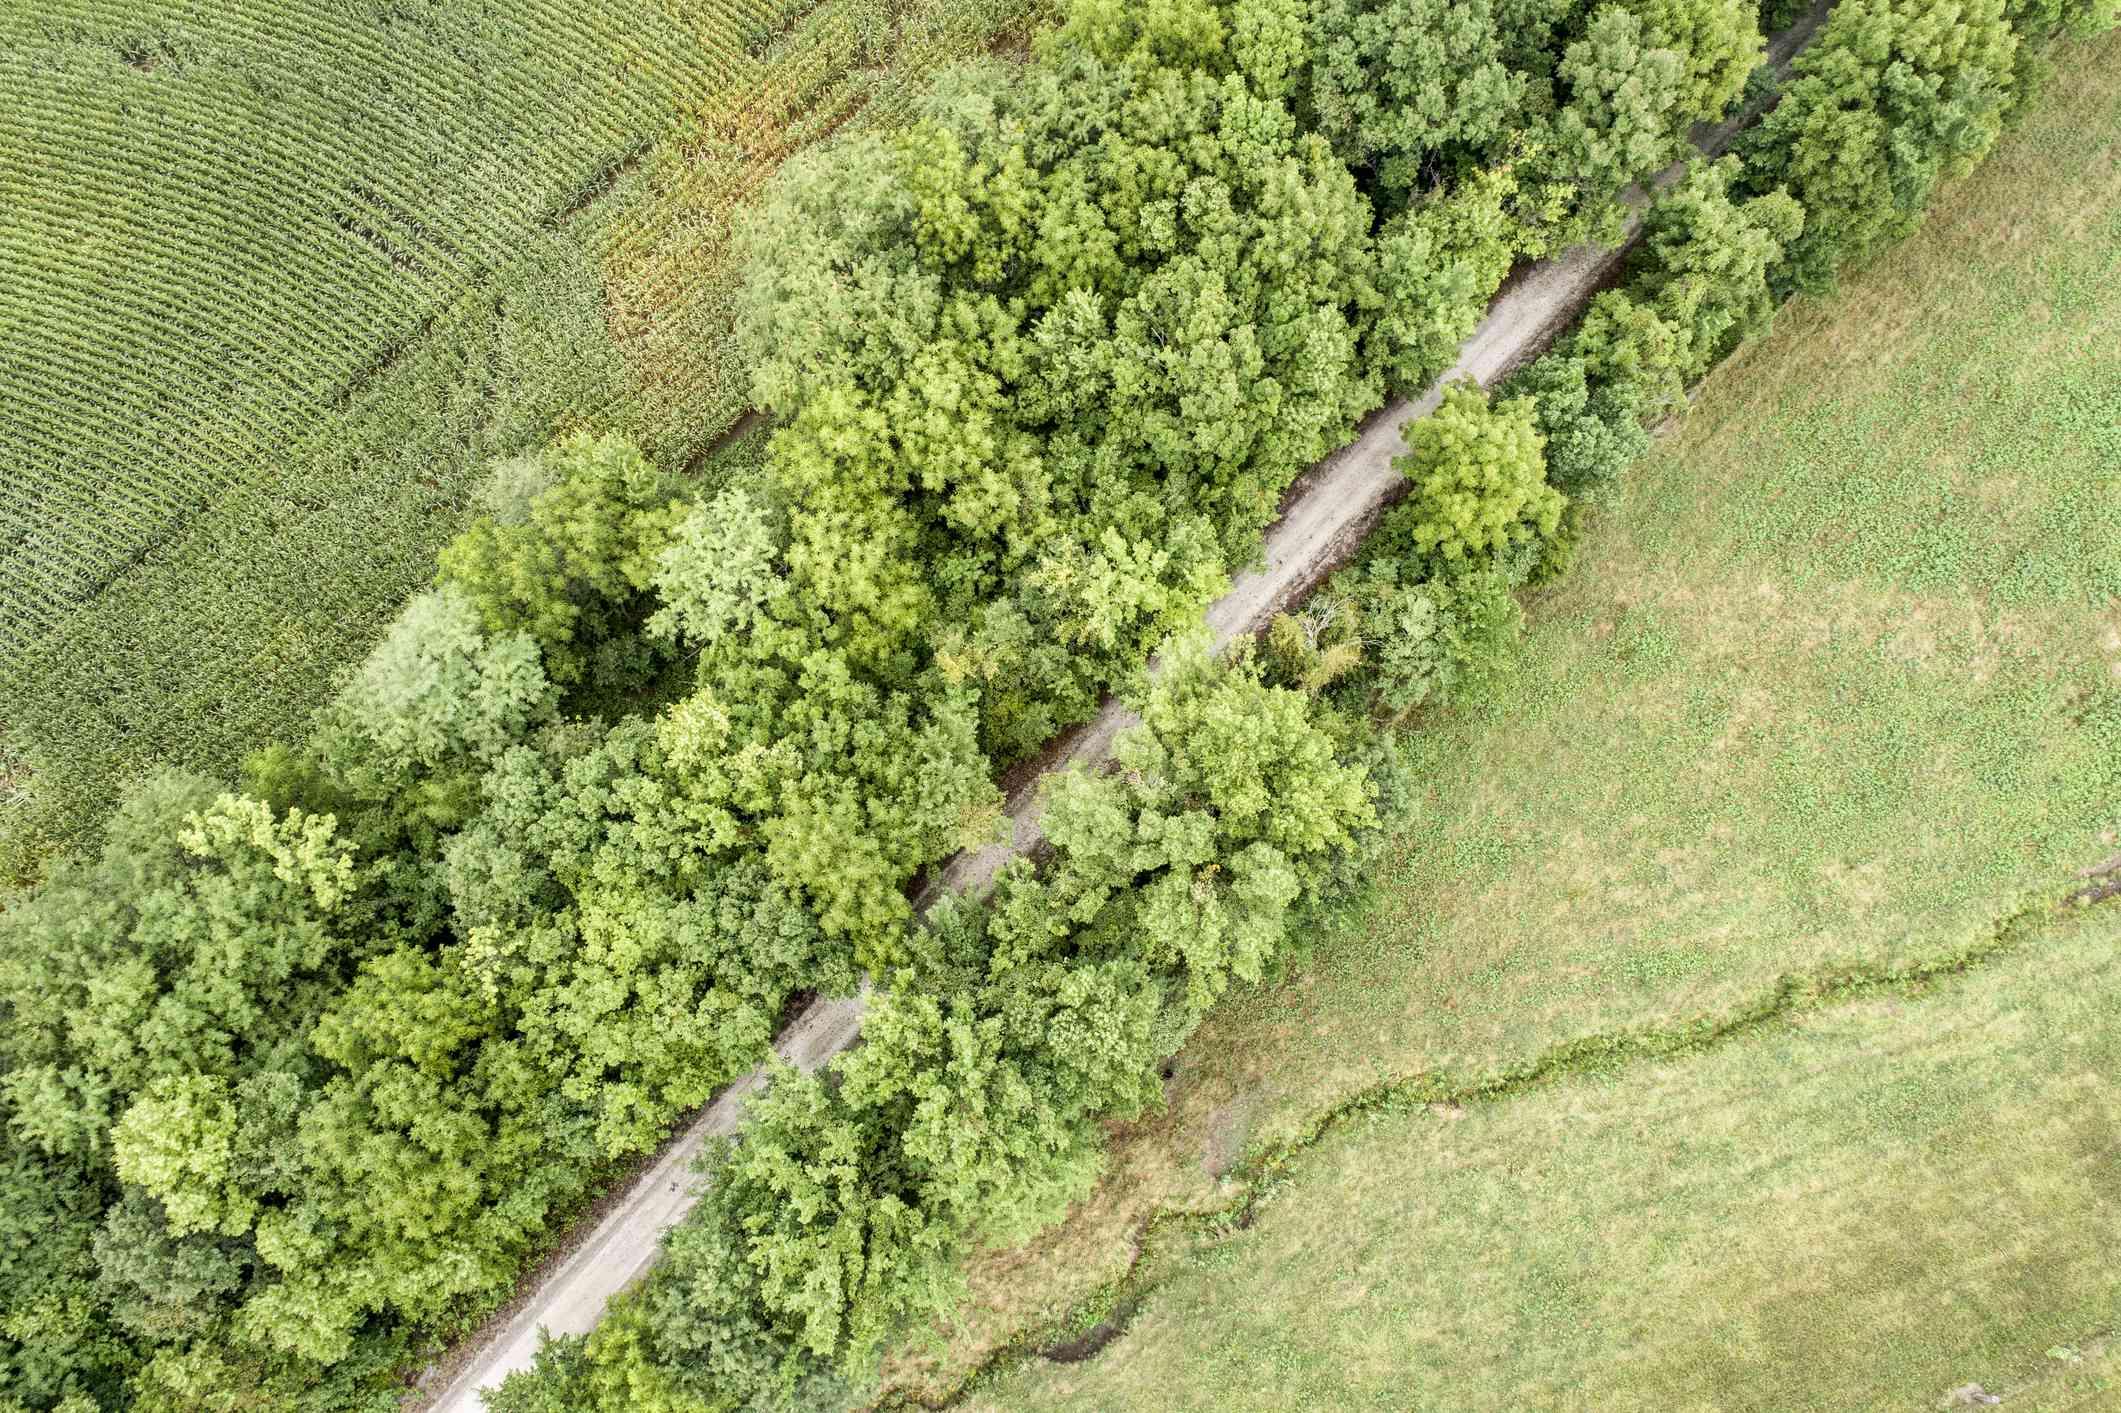 recreational Katy Trail in MIssouri - aerial view